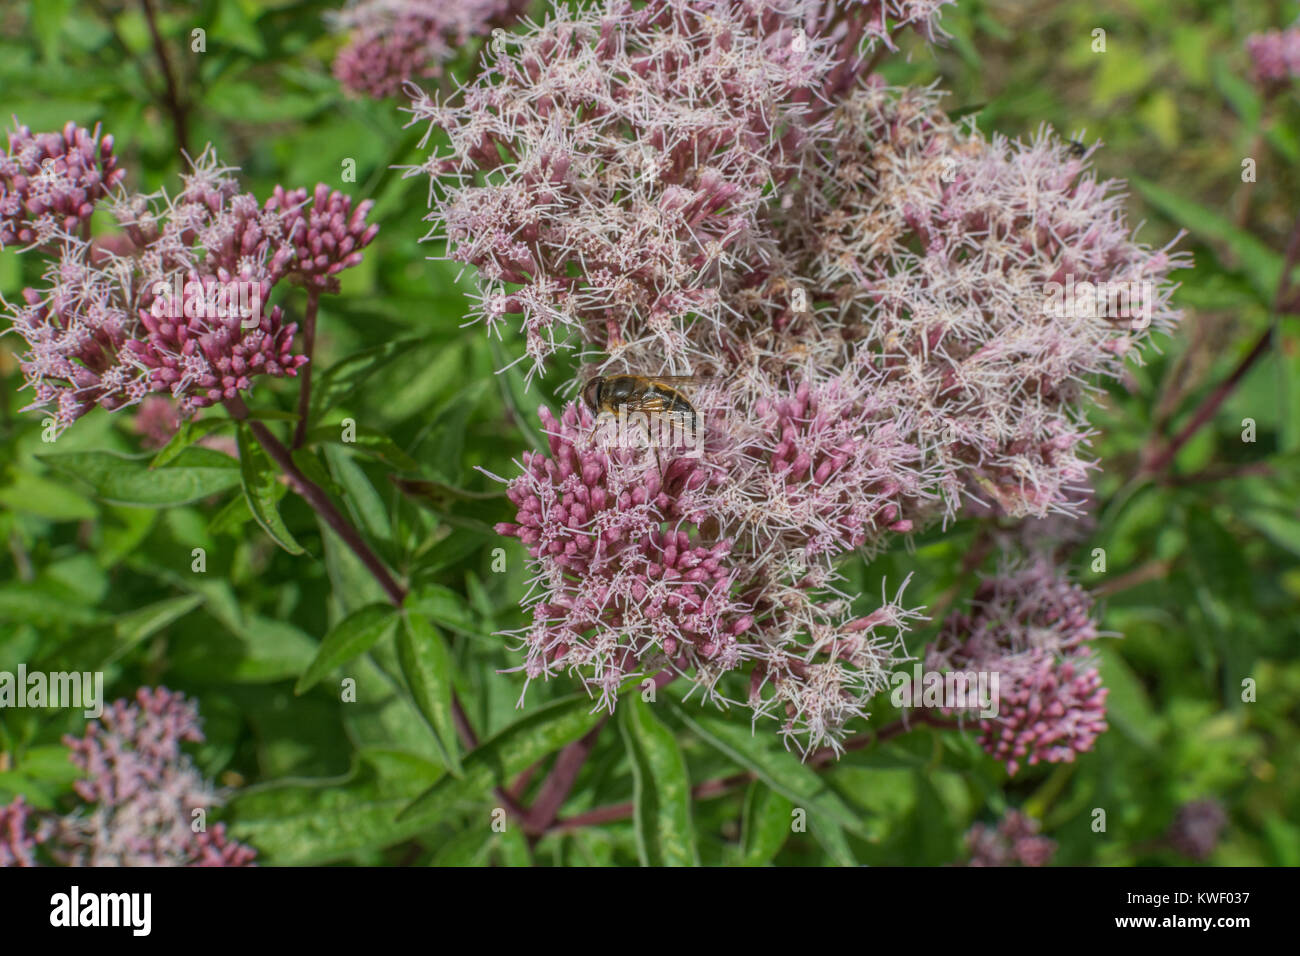 Flowering heads of Hemp Agrimony [Eupatorium cannabinum]. - Stock Image